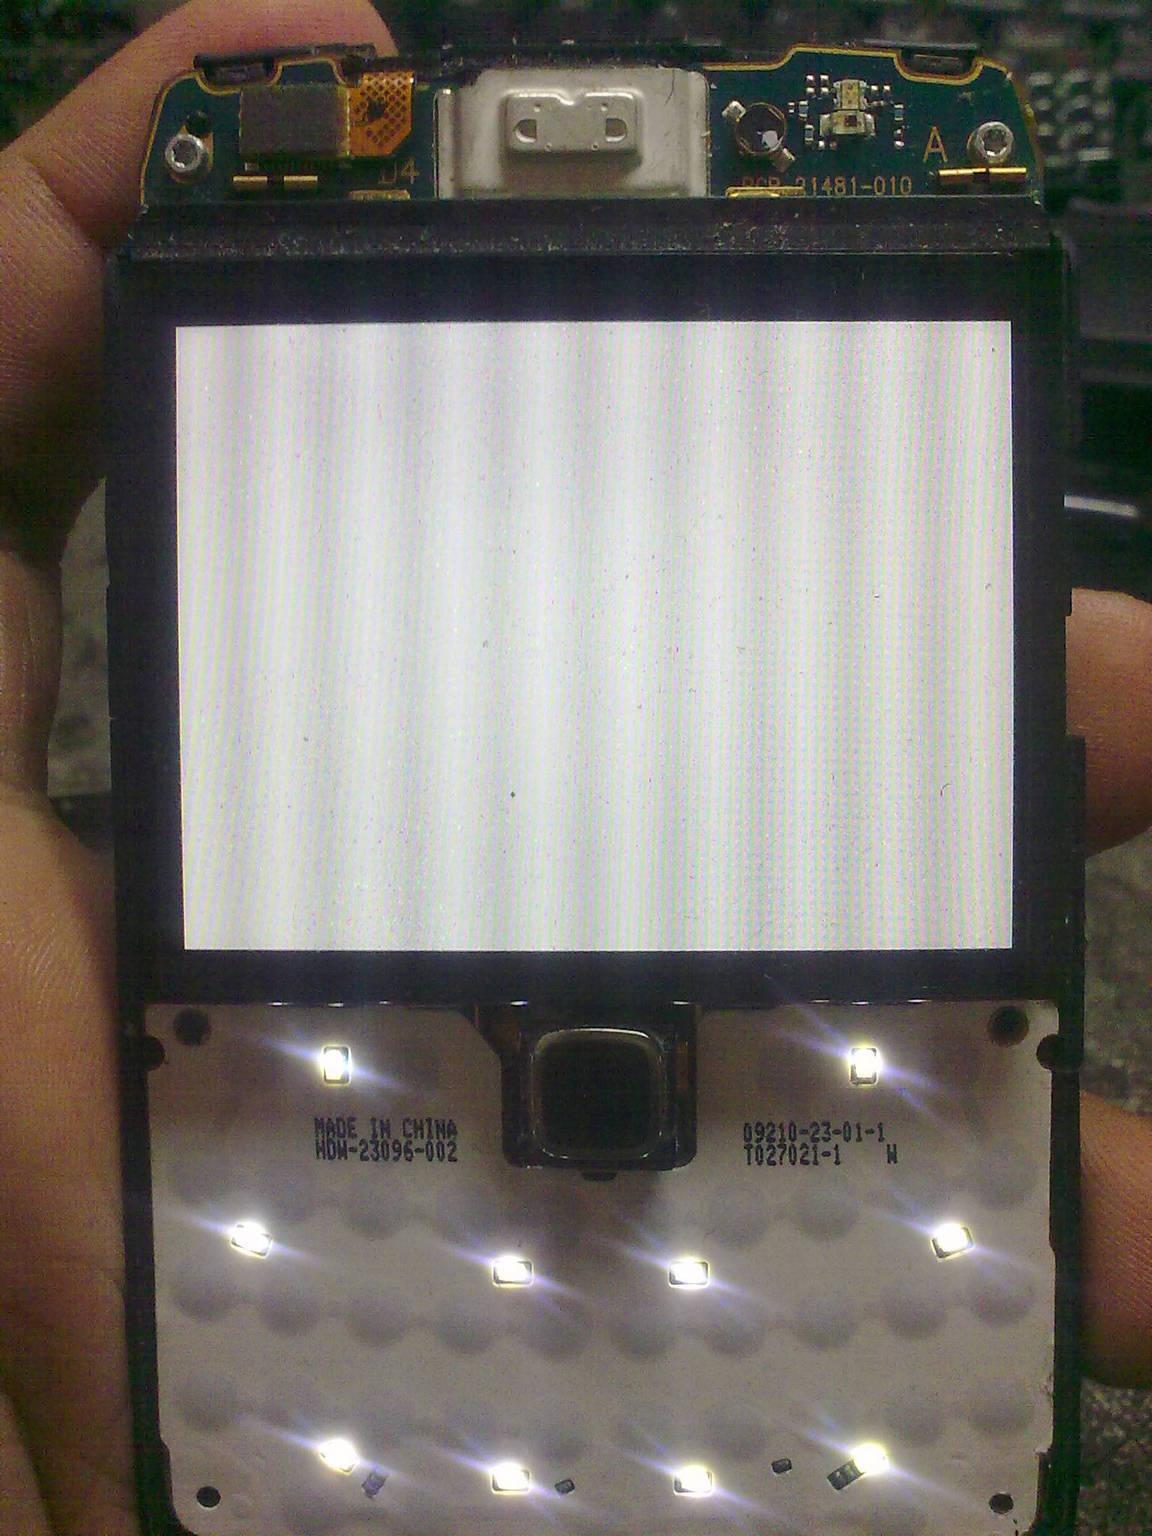 http://3.bp.blogspot.com/-J7CjBseV0so/TicPiSNmNzI/AAAAAAAAAa0/L1cubEFpDSY/s1600/white%2Bscreen.jpg